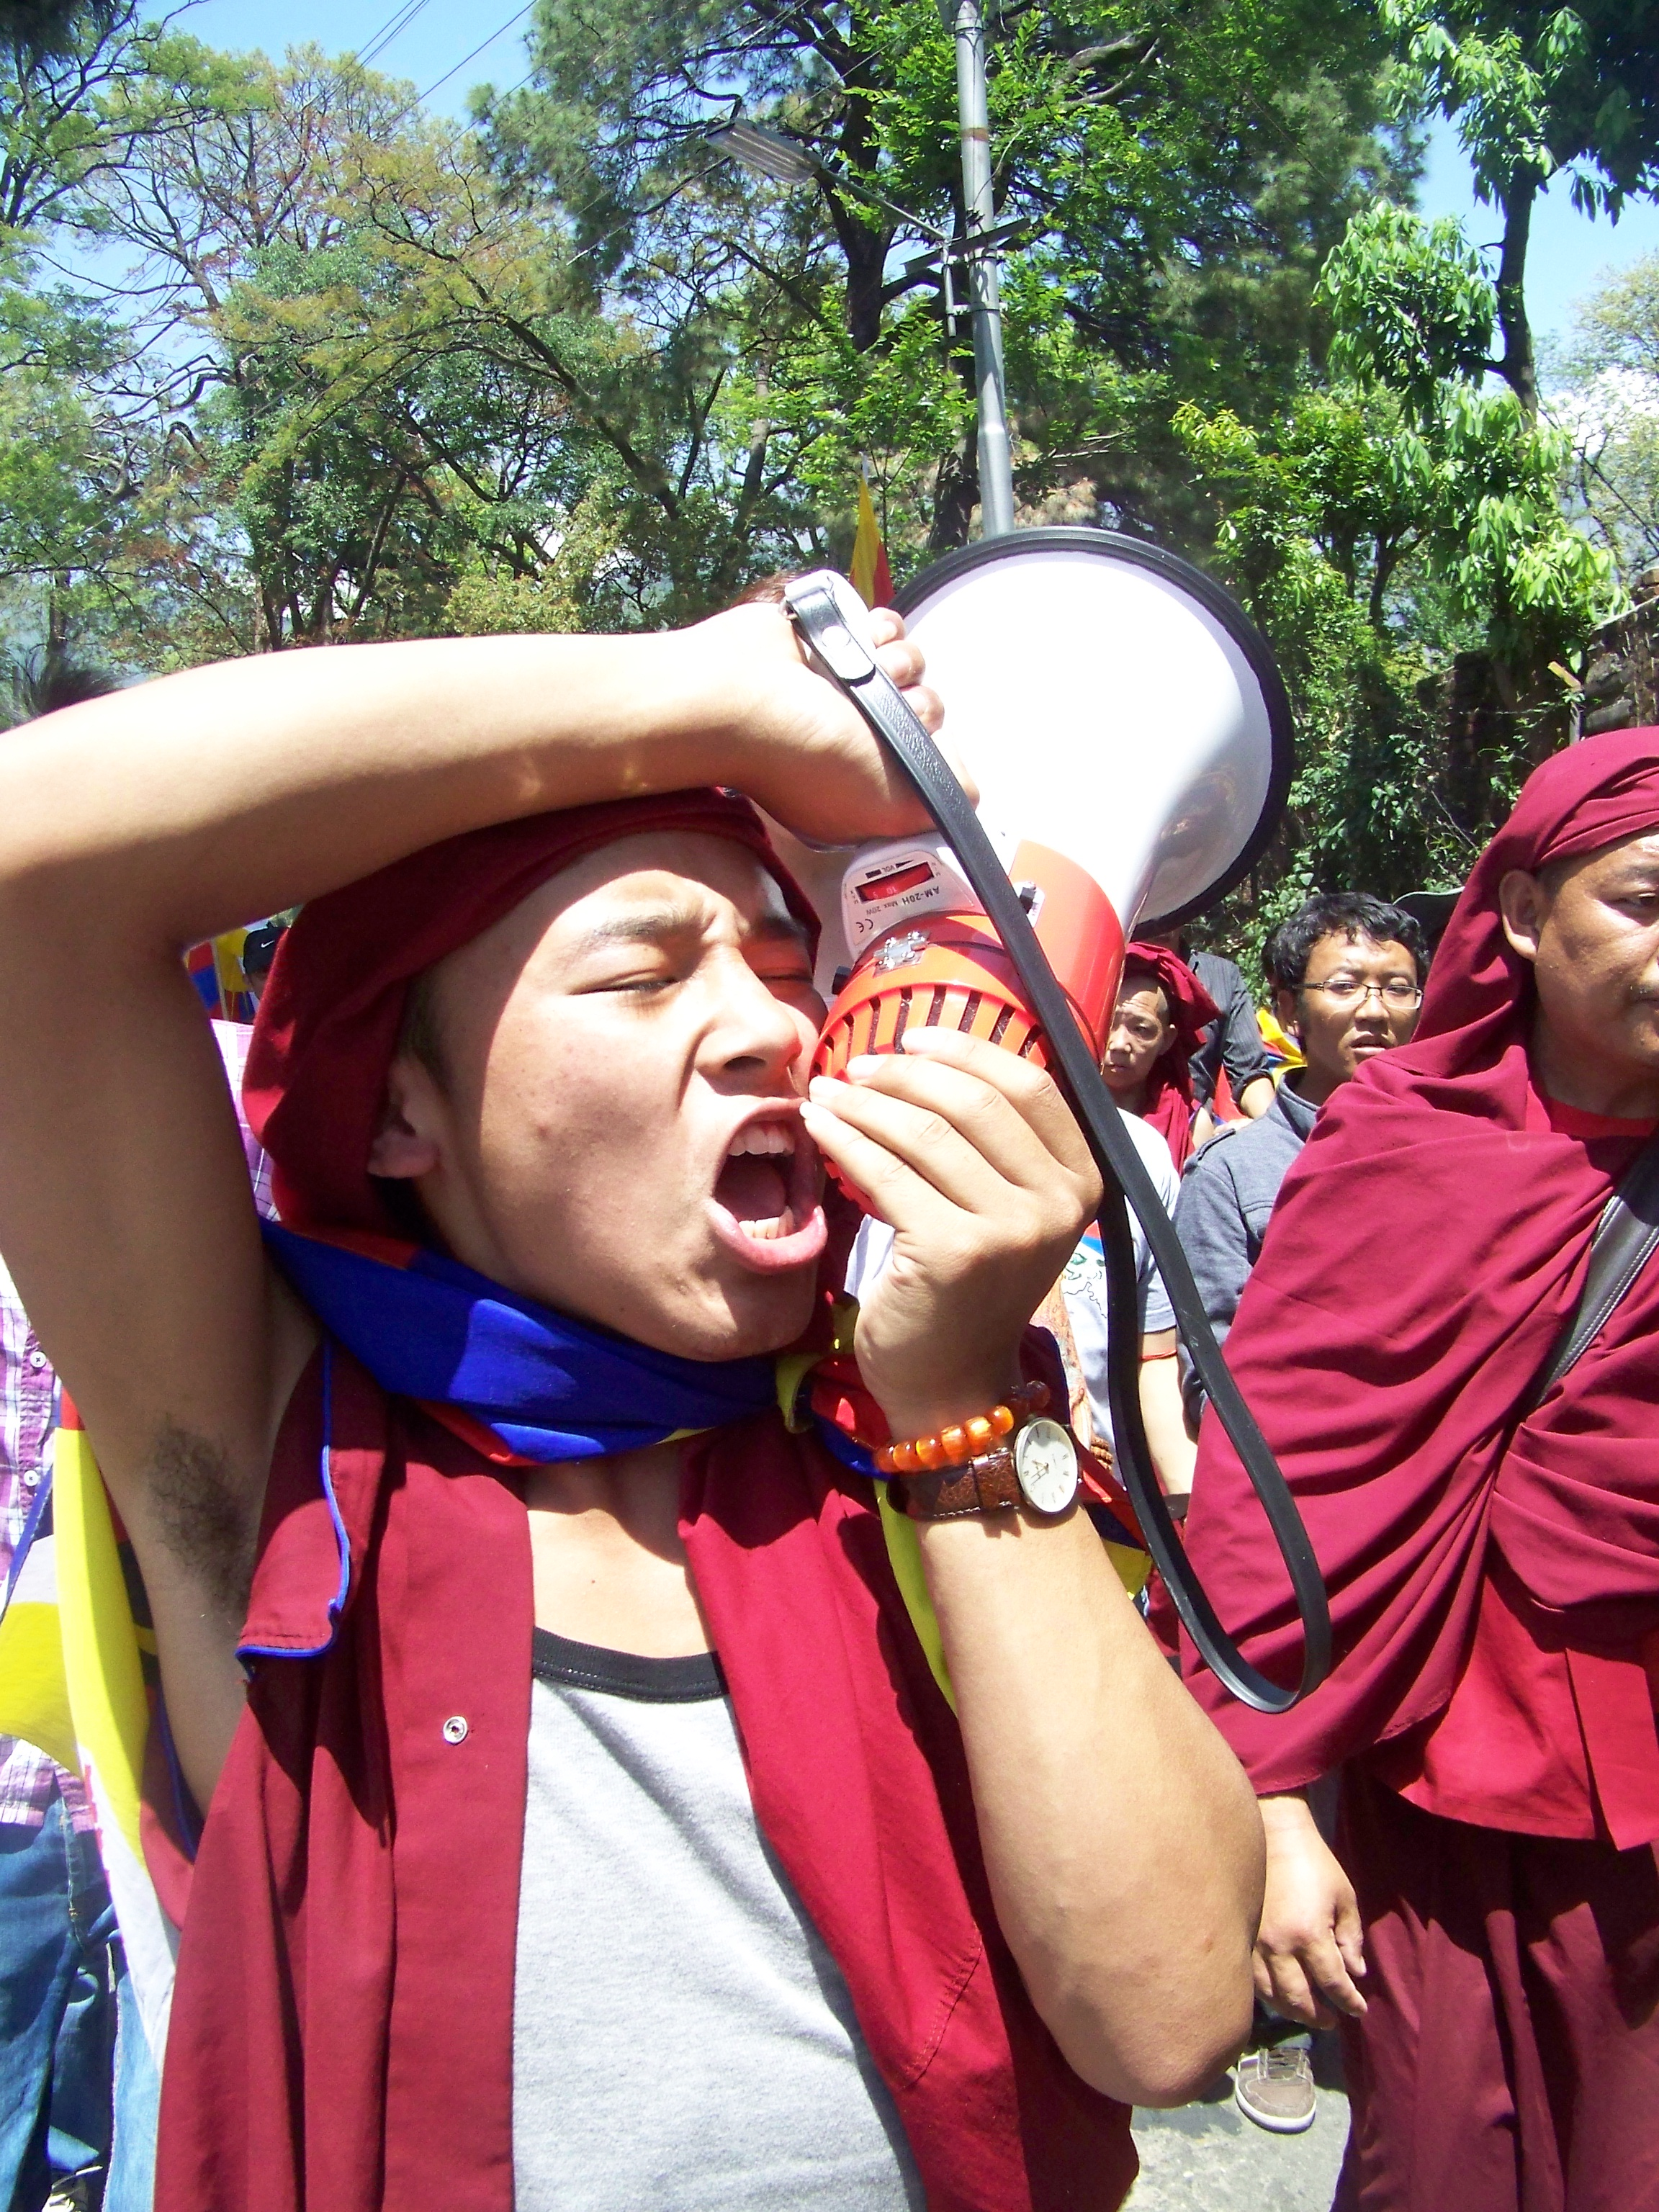 100_3378 Jonathan Machler, Tibétains à Dharamsala, Copyright